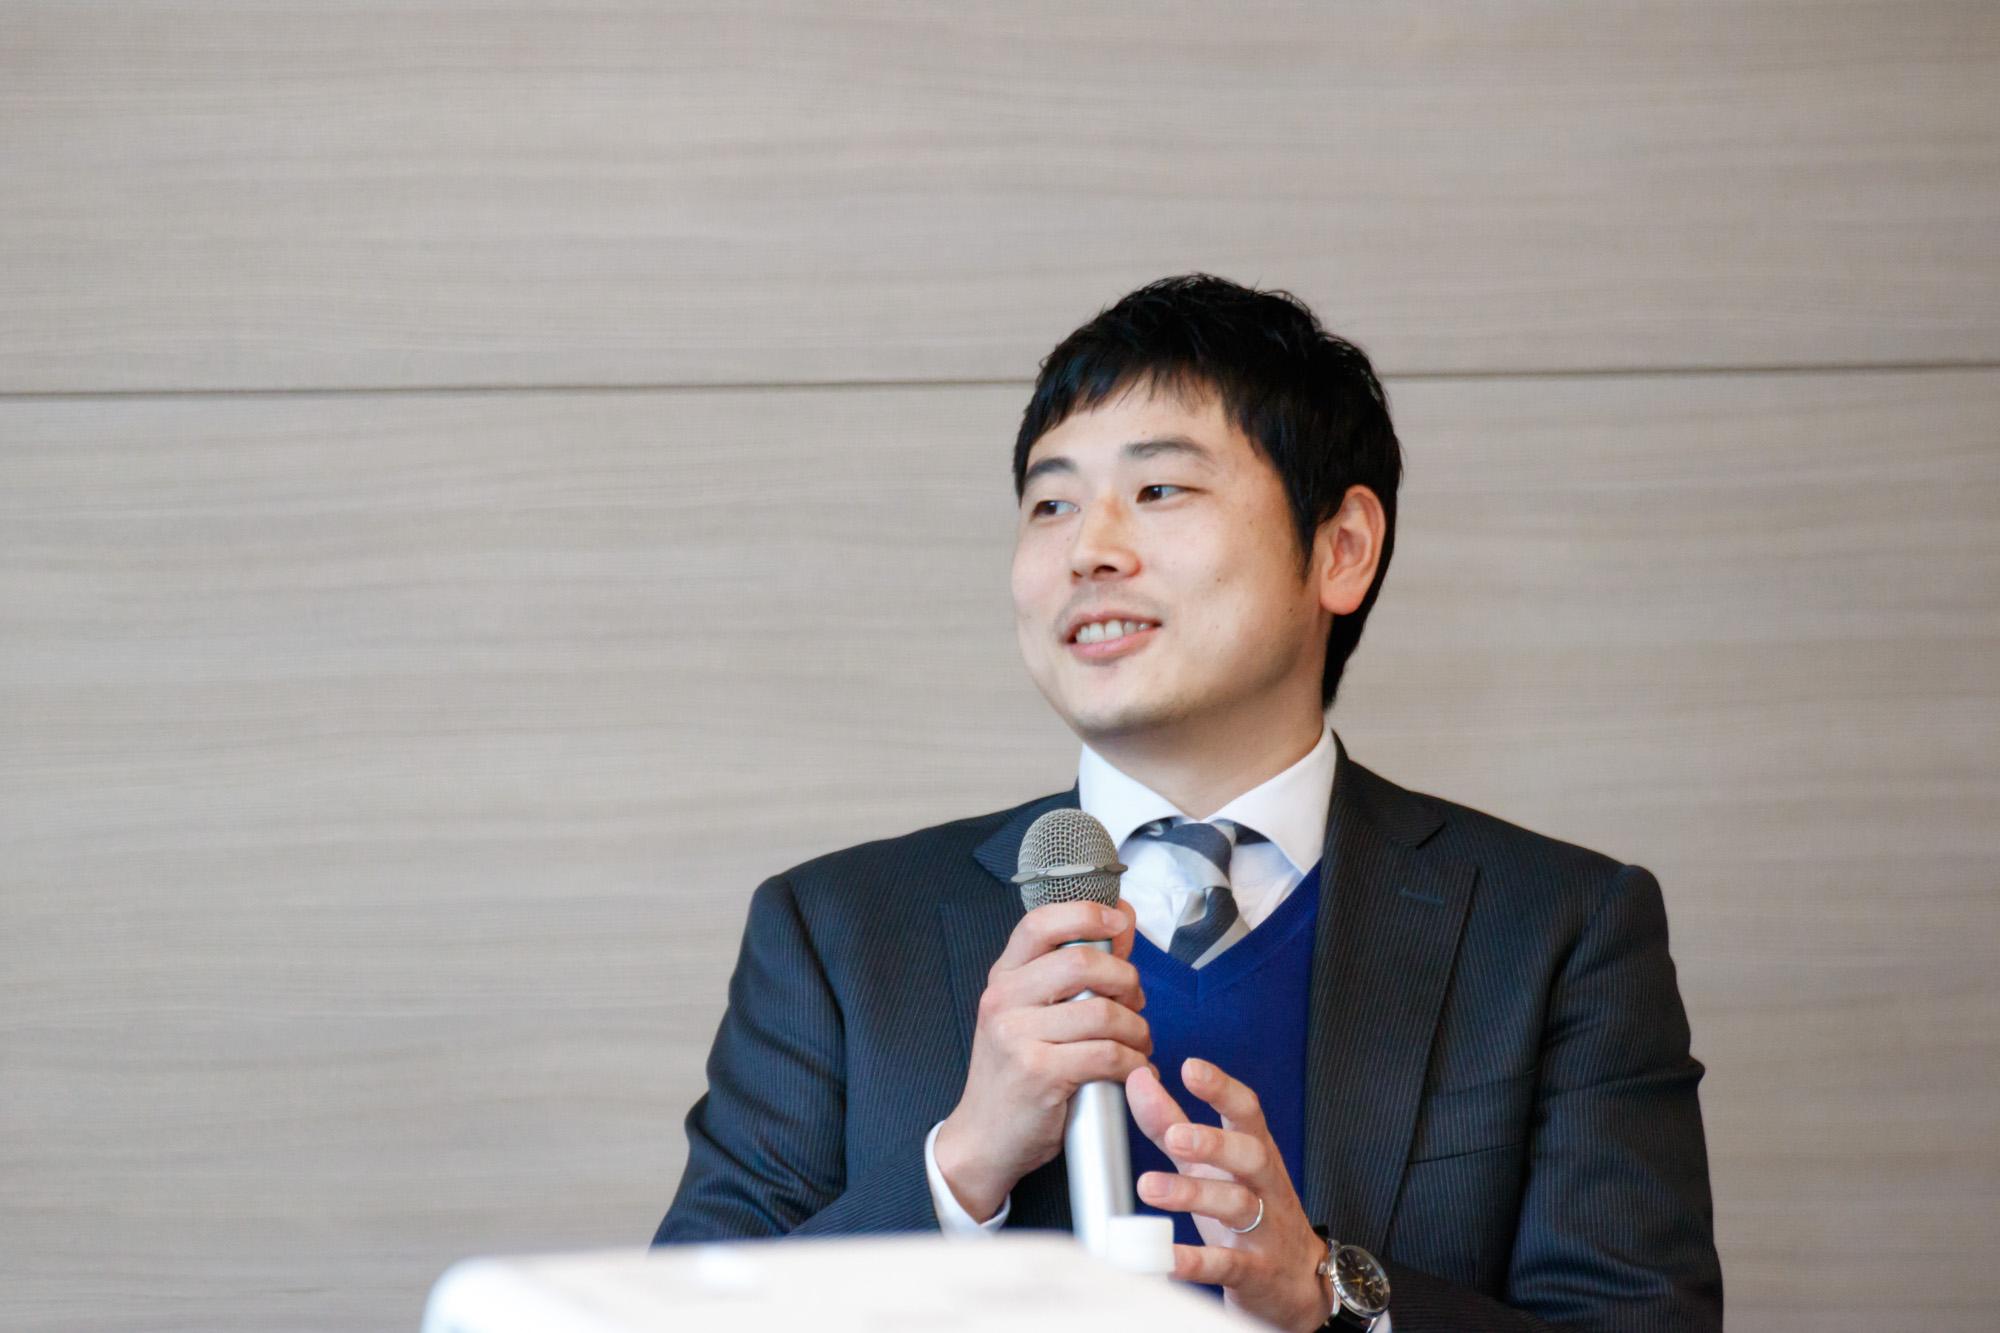 鈴木 博史(株式会社経営共創基盤 マネジャー/公認会計士)